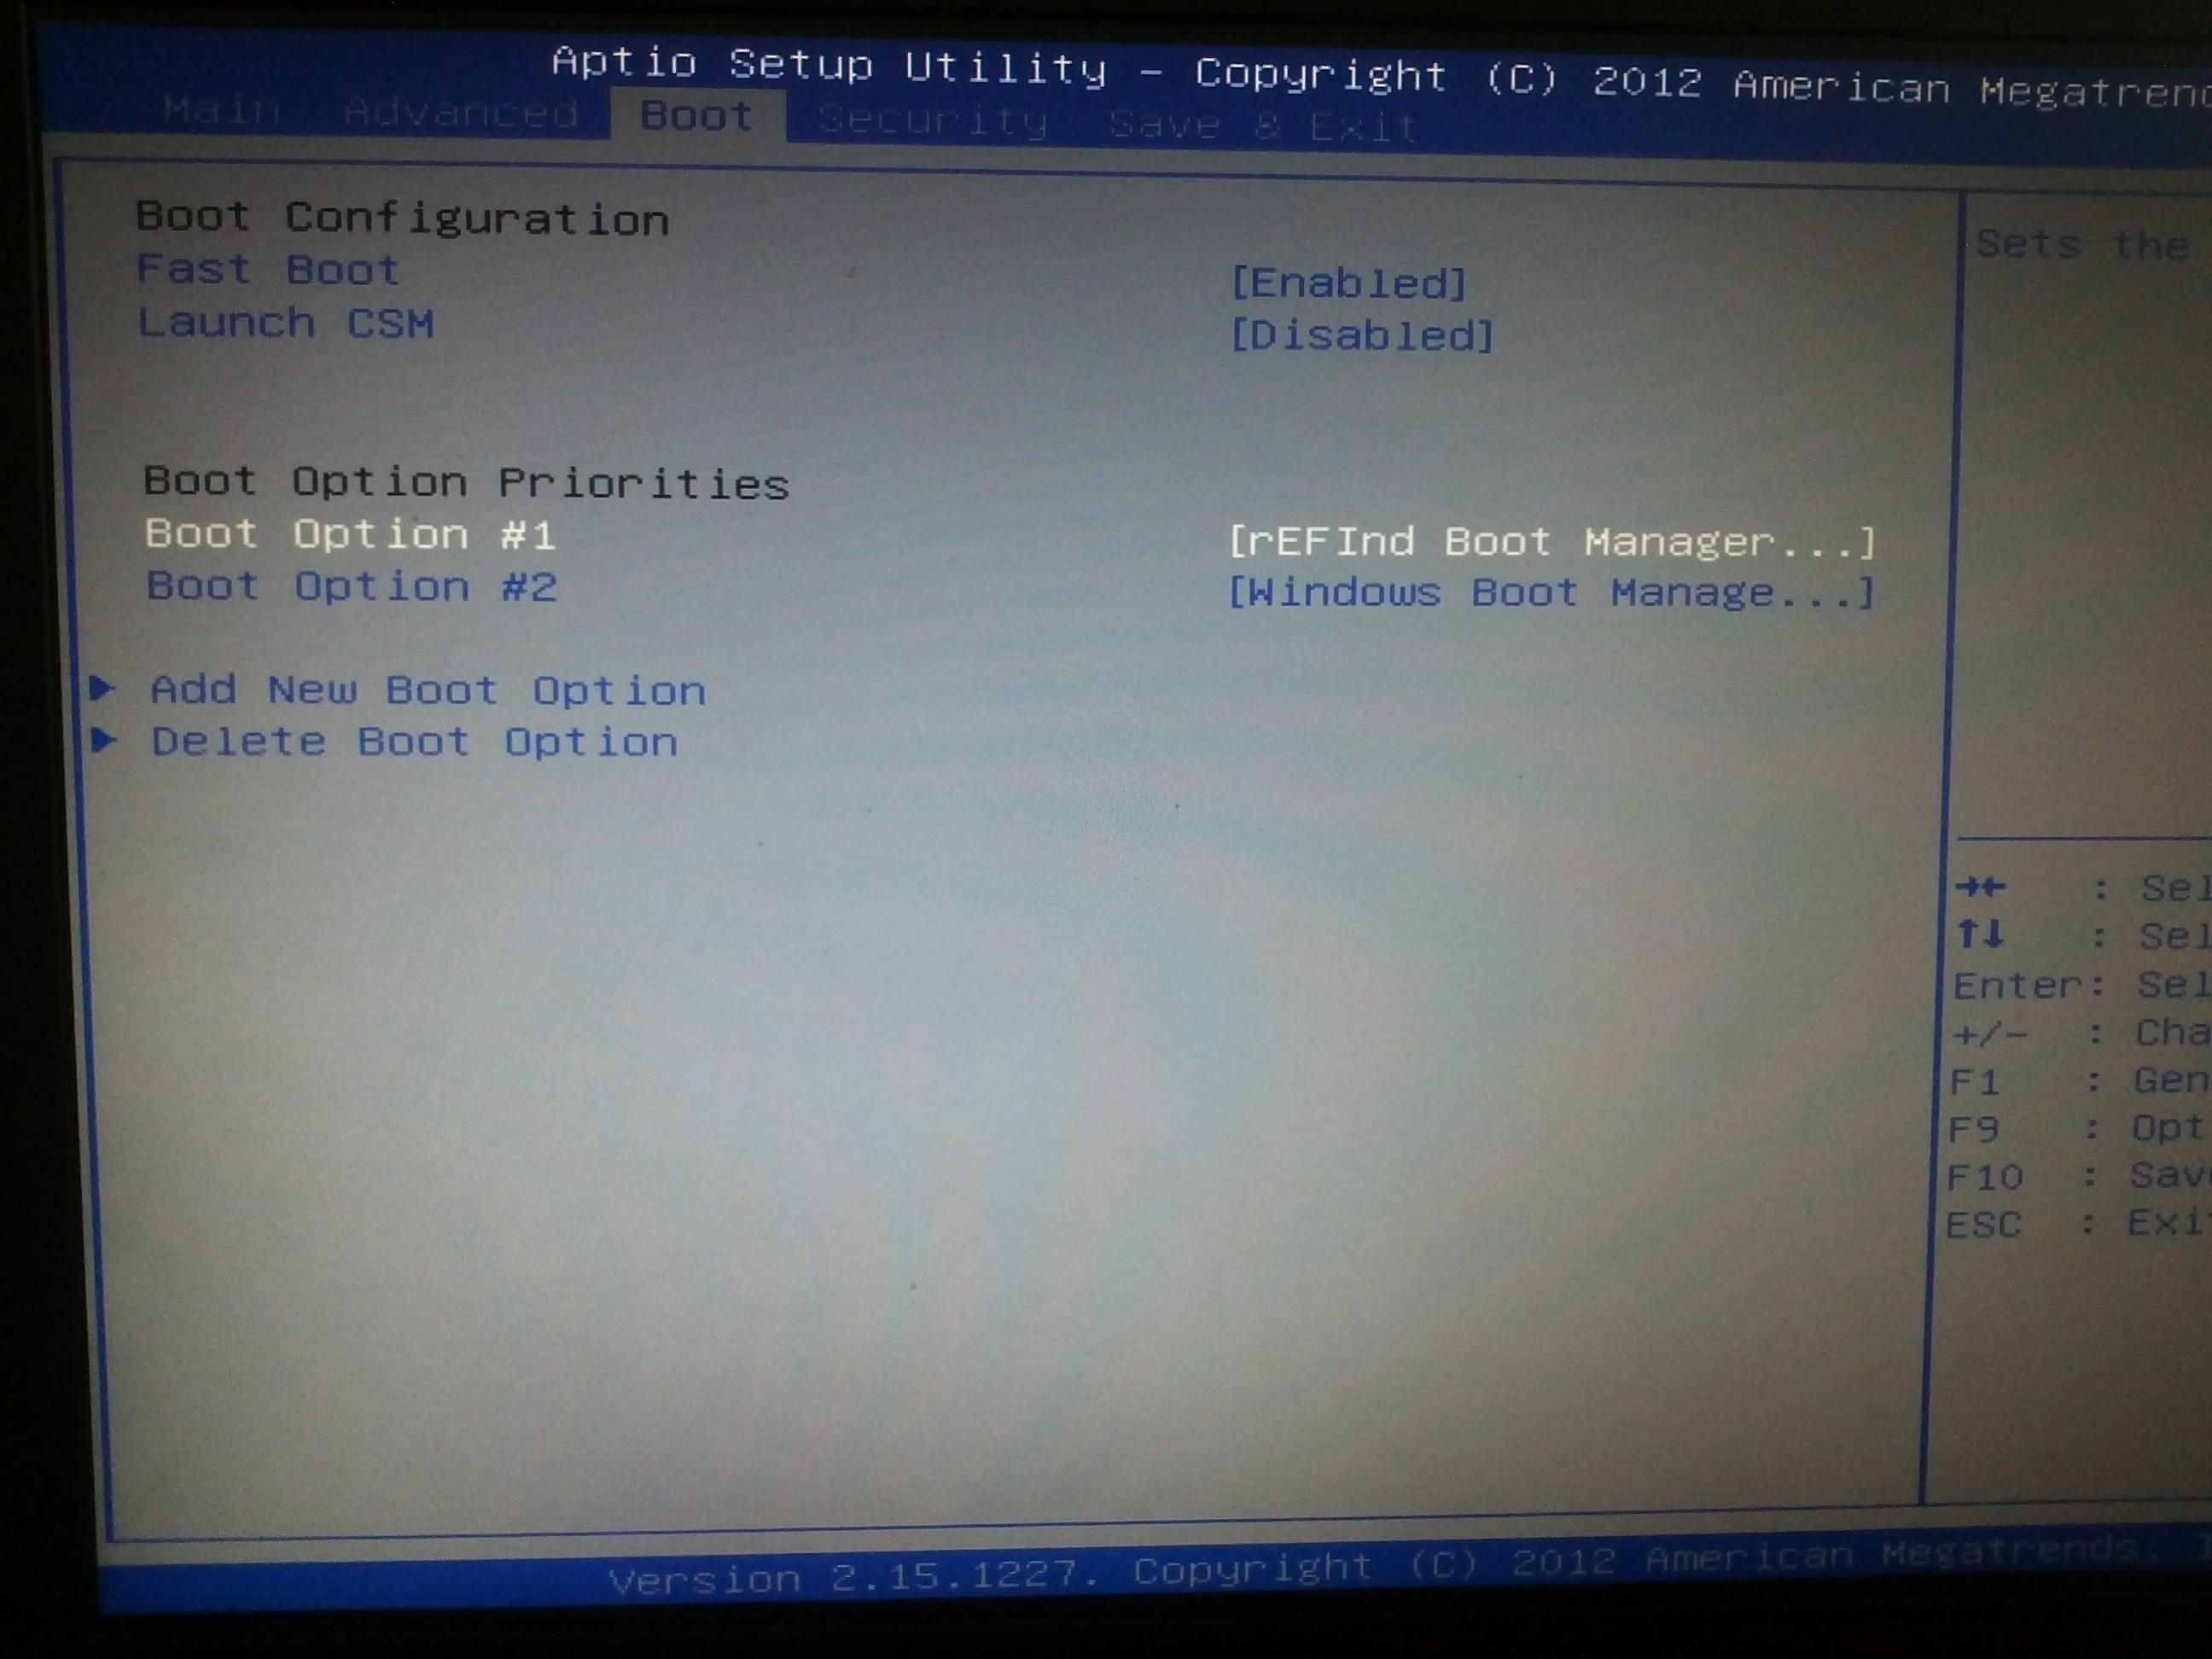 Dual boot ArchLinux и Windows 8 на UEFI без GRUB c помощью rEFInd / Хабрахабр